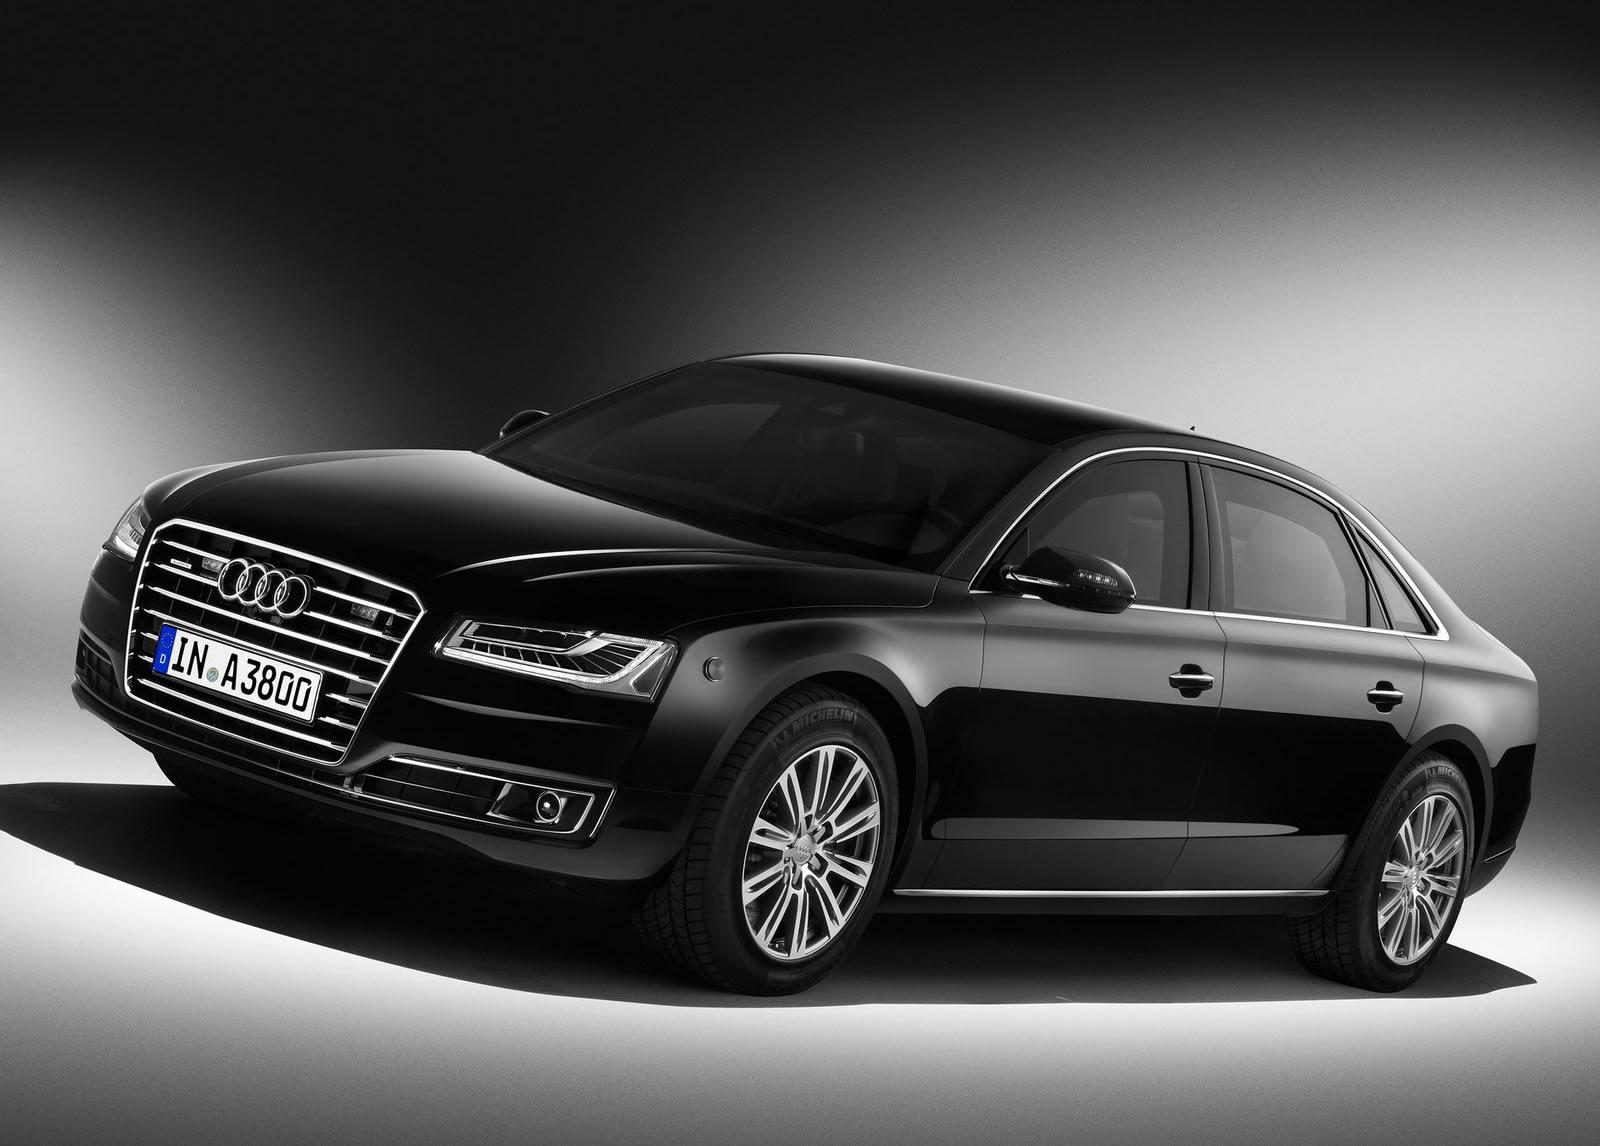 Audi Vehicles 2015 1 Background Wallpaper Car Hd Wallpaper